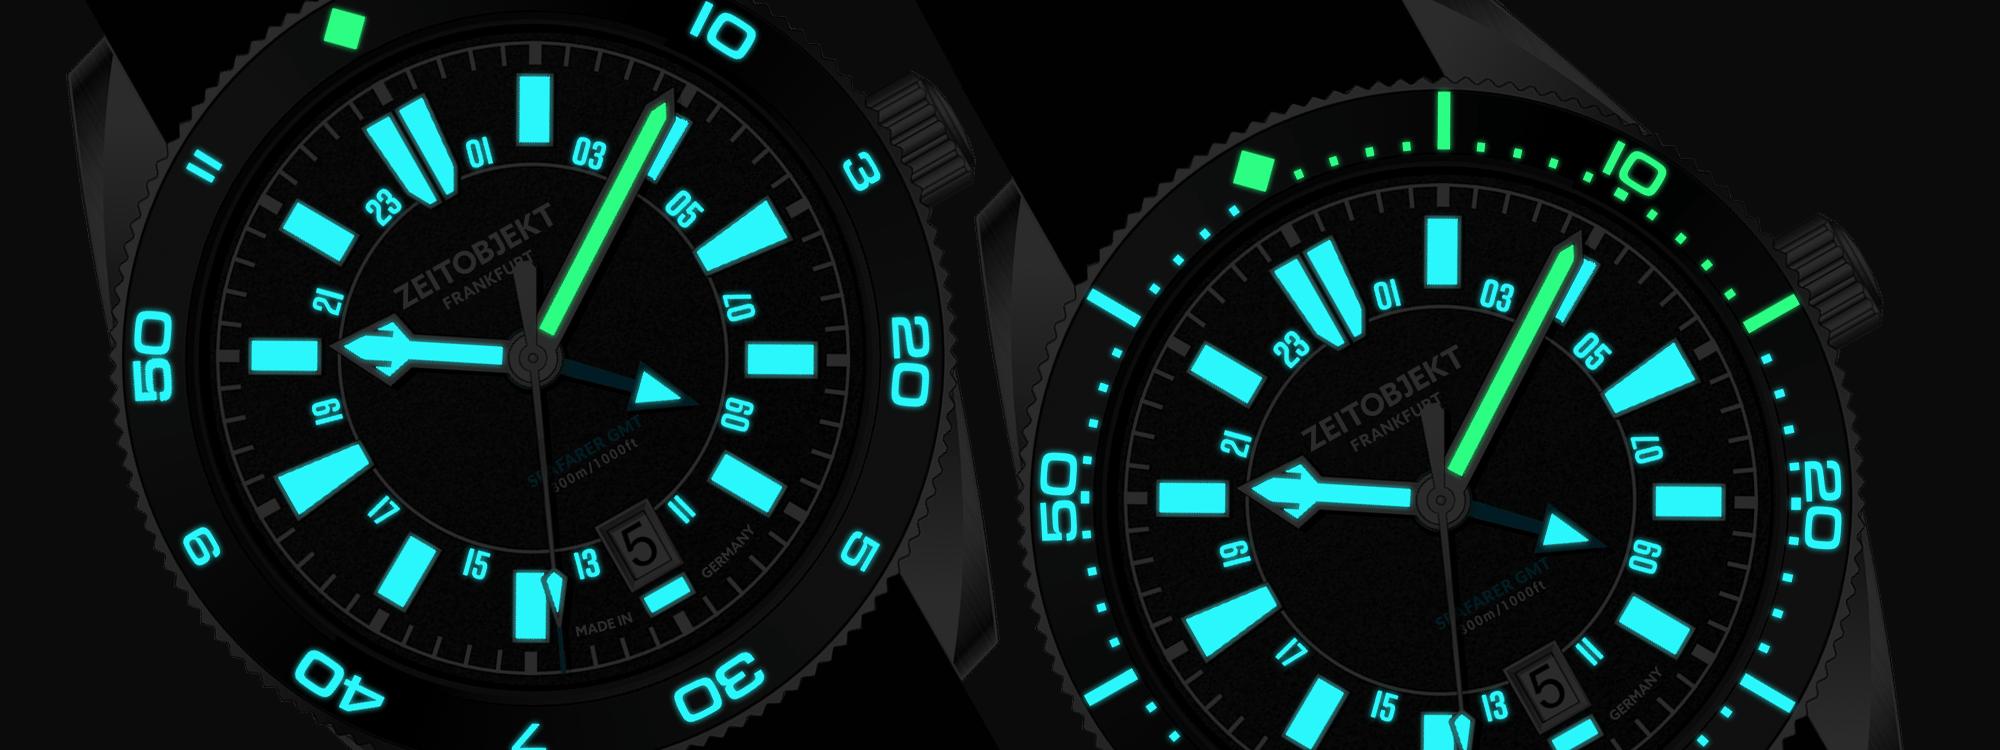 Hybrid (left), Pure Diver (right). Bi-color SuperLuminova ®  BGW9 (blue)and C1 (green) for superior readability in the dark.